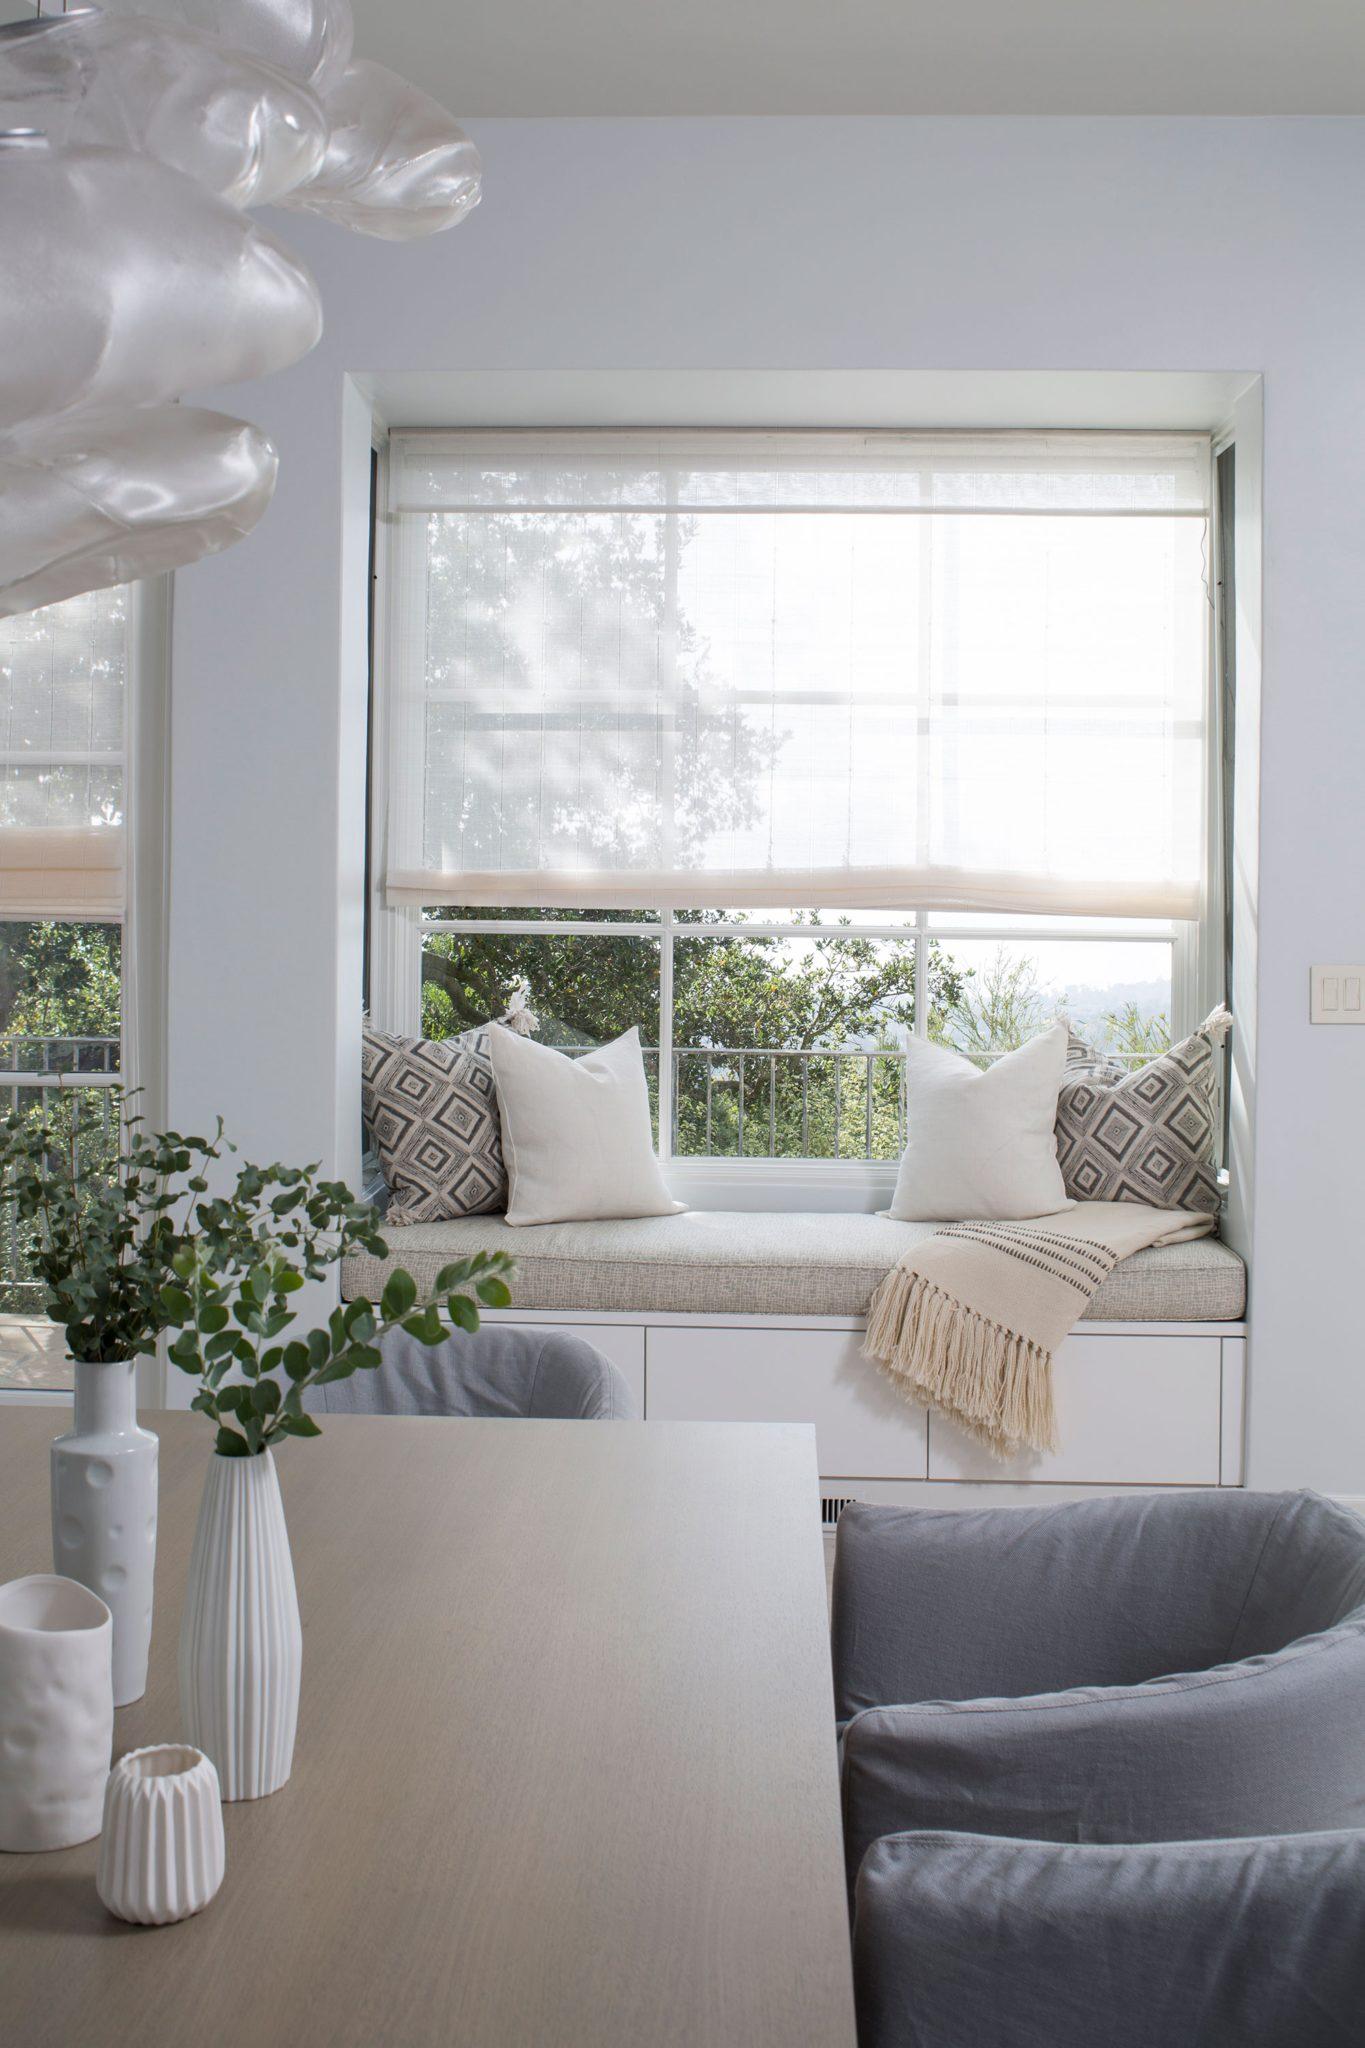 Interior design bySmith Firestone Associates